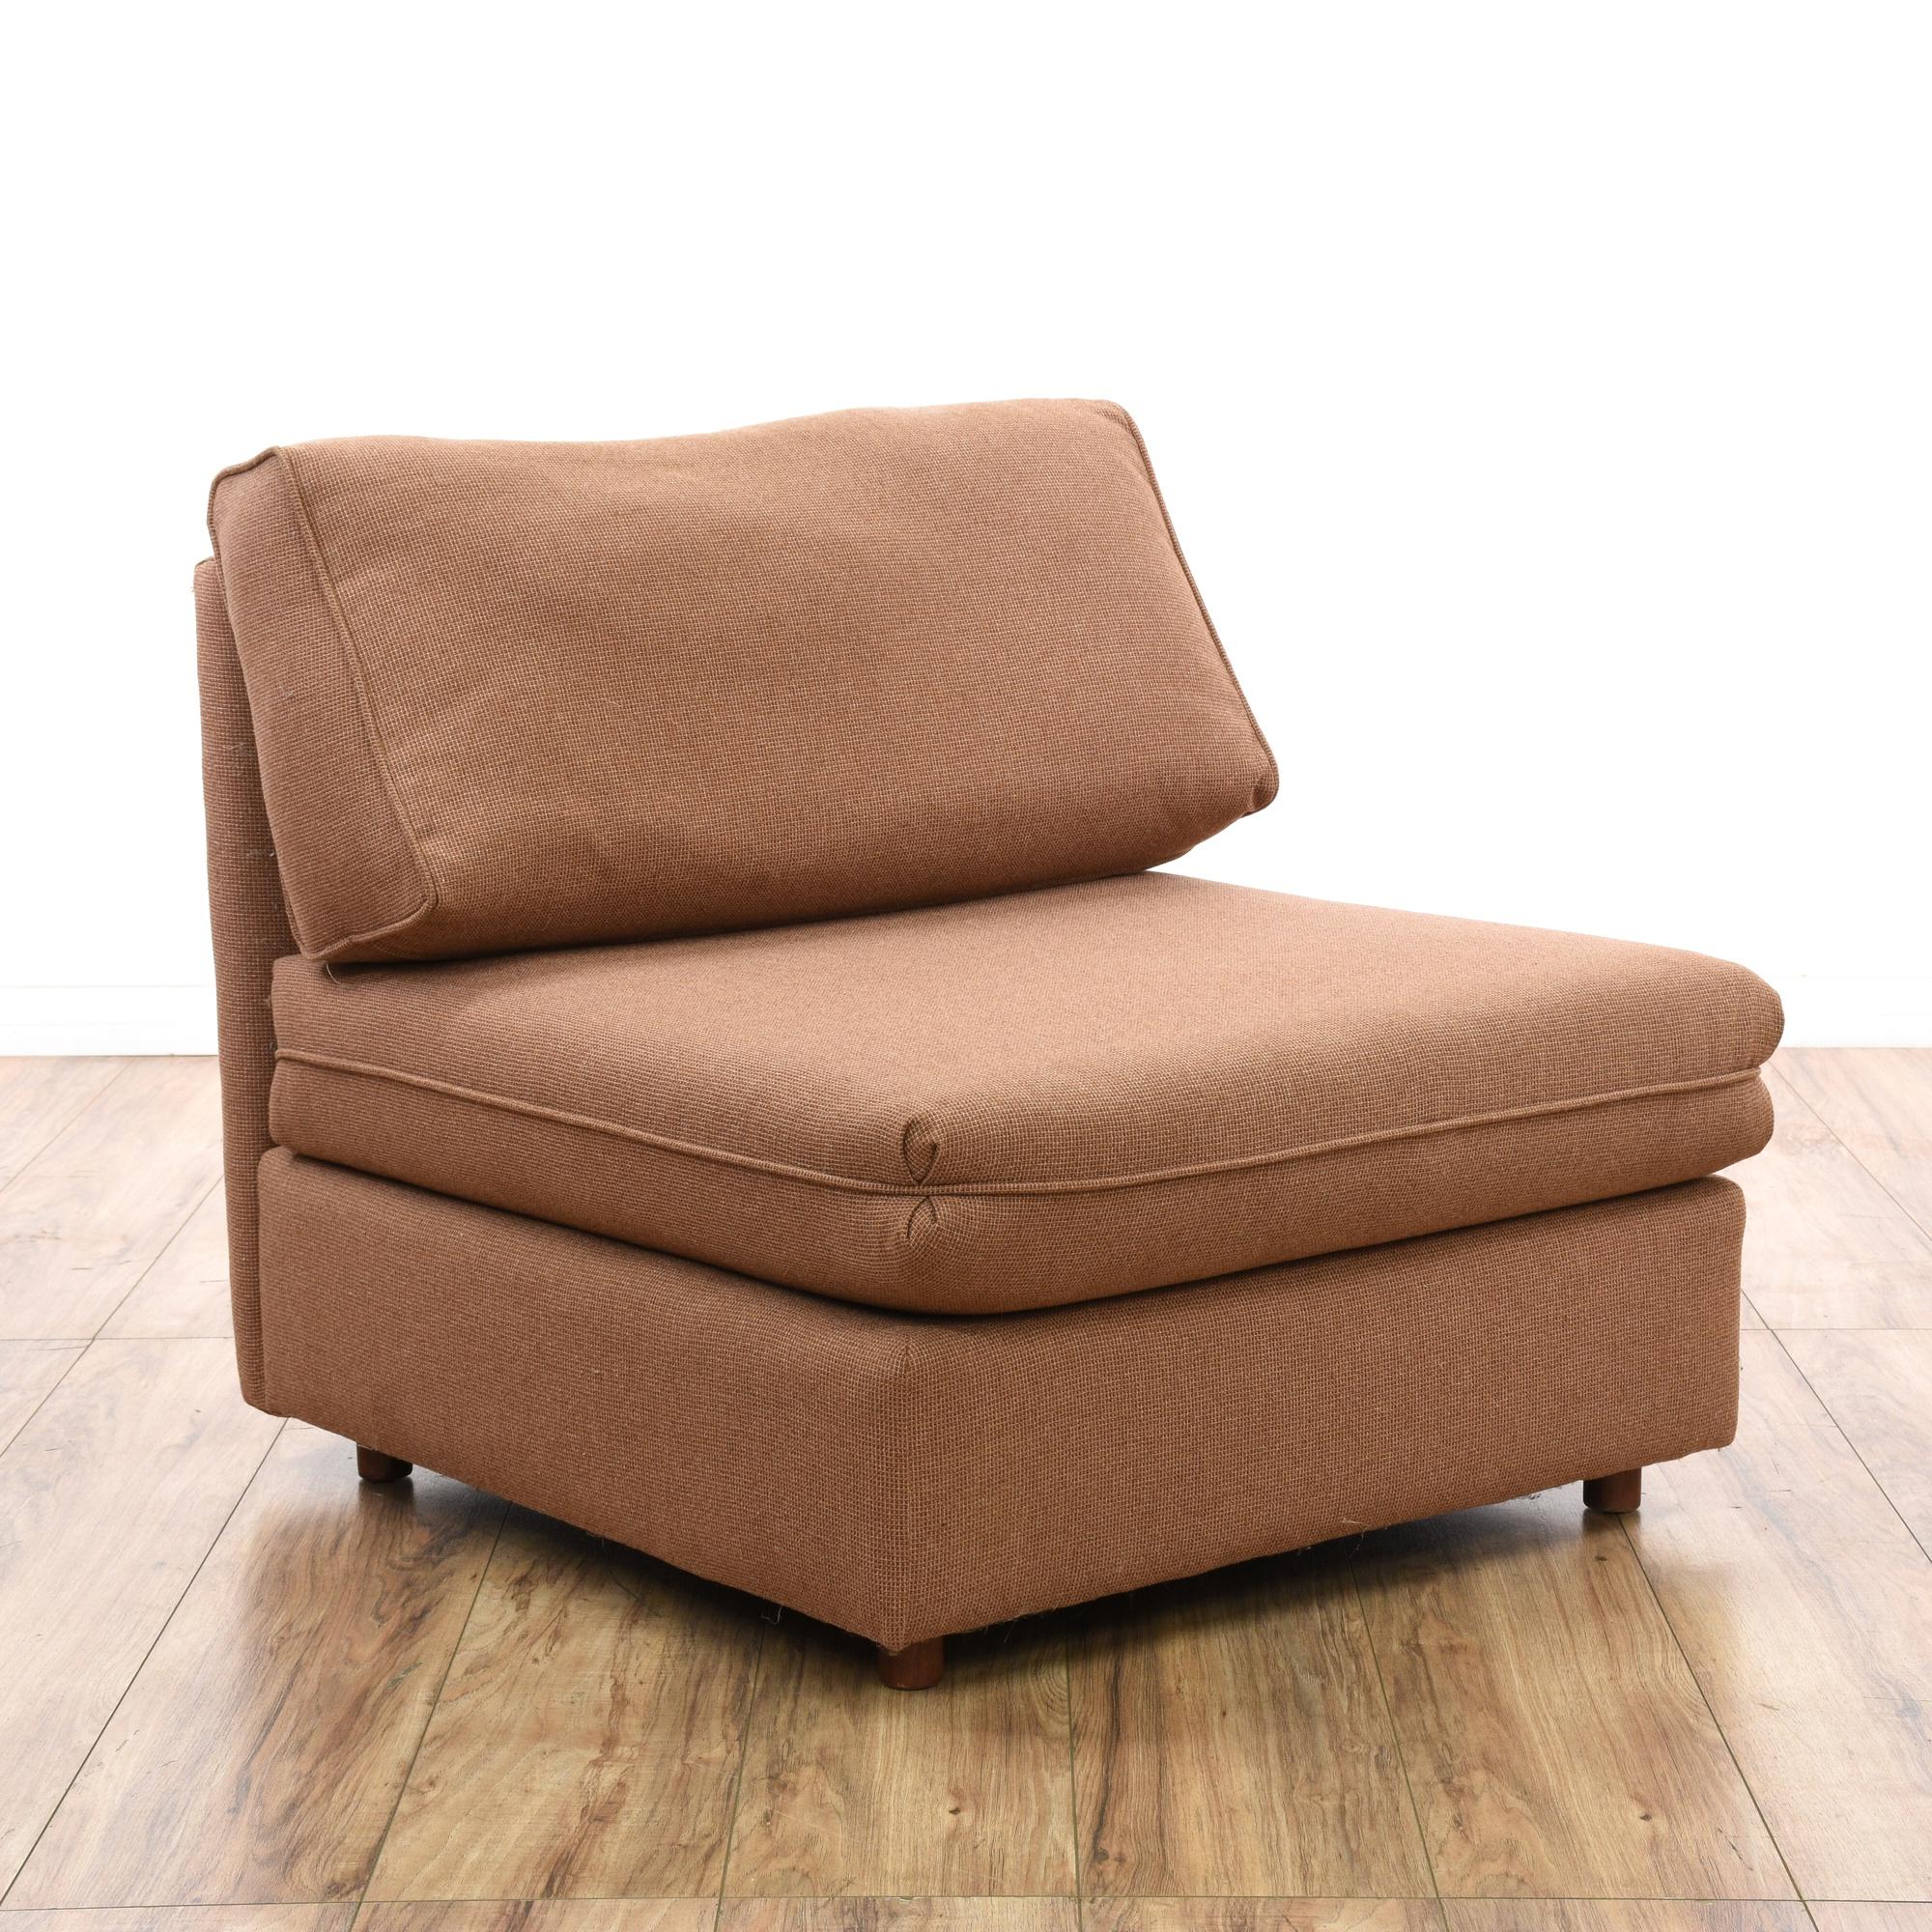 Pair Of Mauve Armless Sofa Chairs Amp Ottoman Loveseat